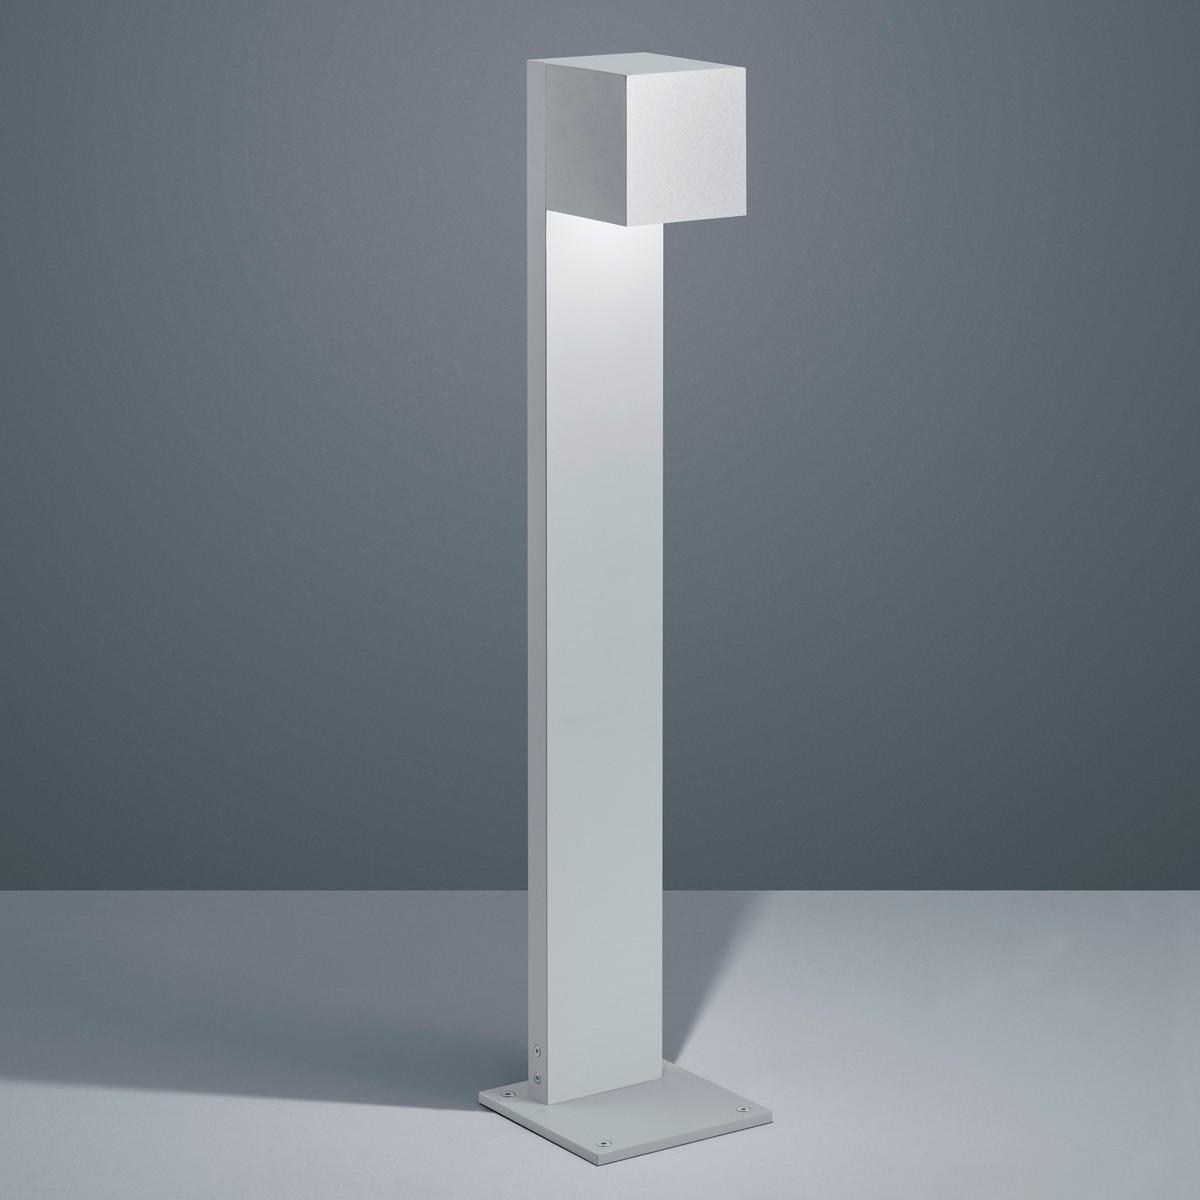 Helestra Siri 44 LED Pollerleuchte, silbergrau